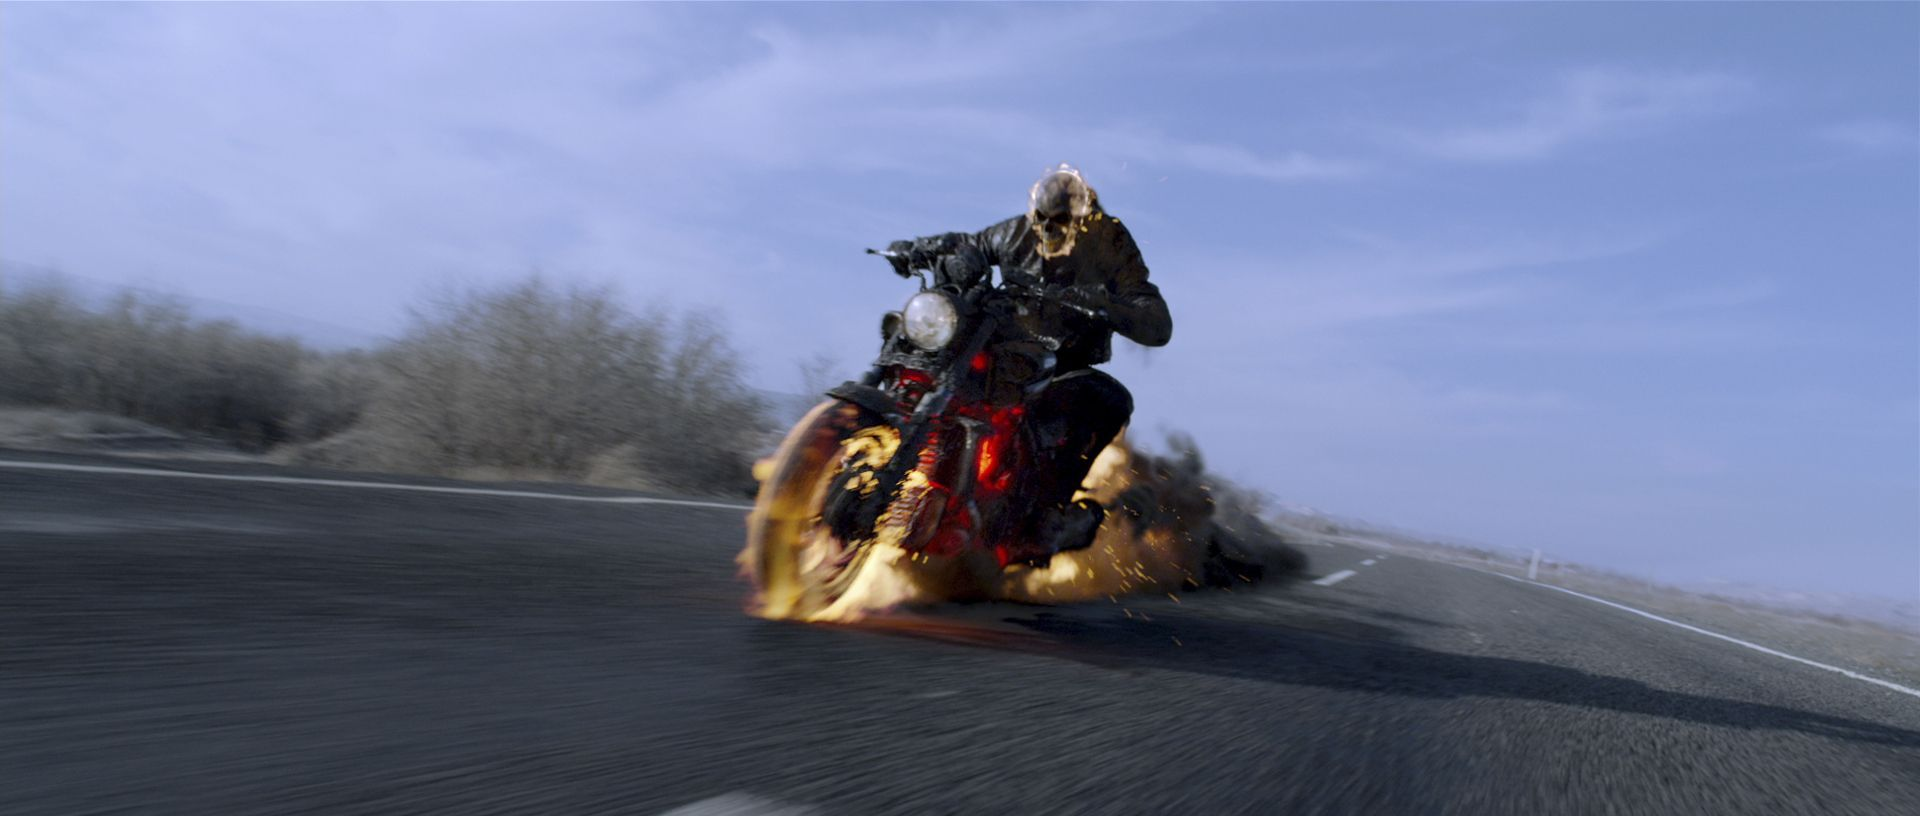 Ghost rider: spirit of vengeance full hd video movie free download.